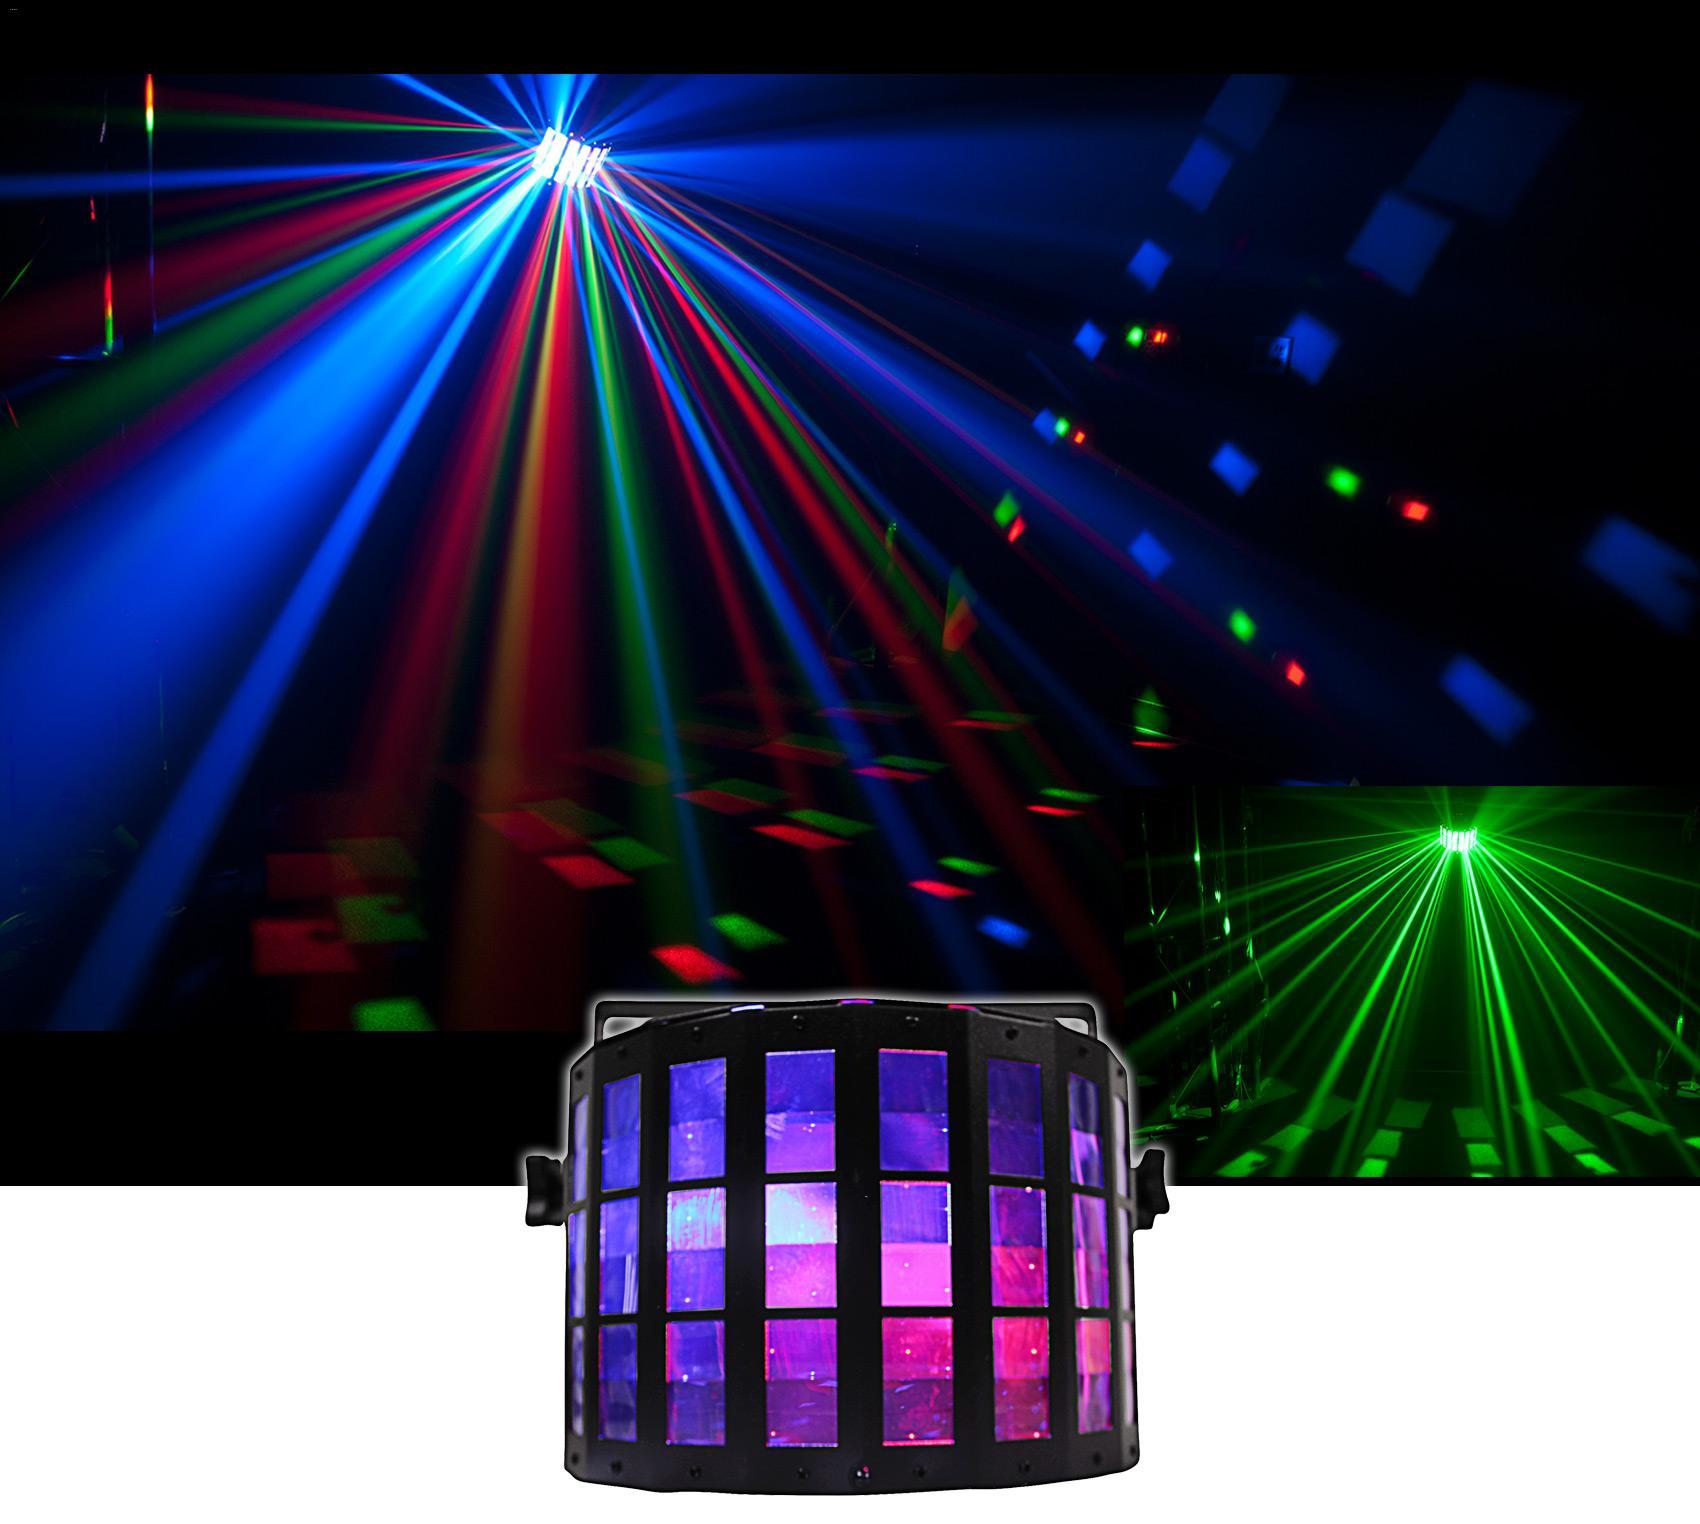 Bluetooth Model LED Laser Projector DJ Stage Ligh Club Disco Lighting Dance Party KTV Bar Lamp